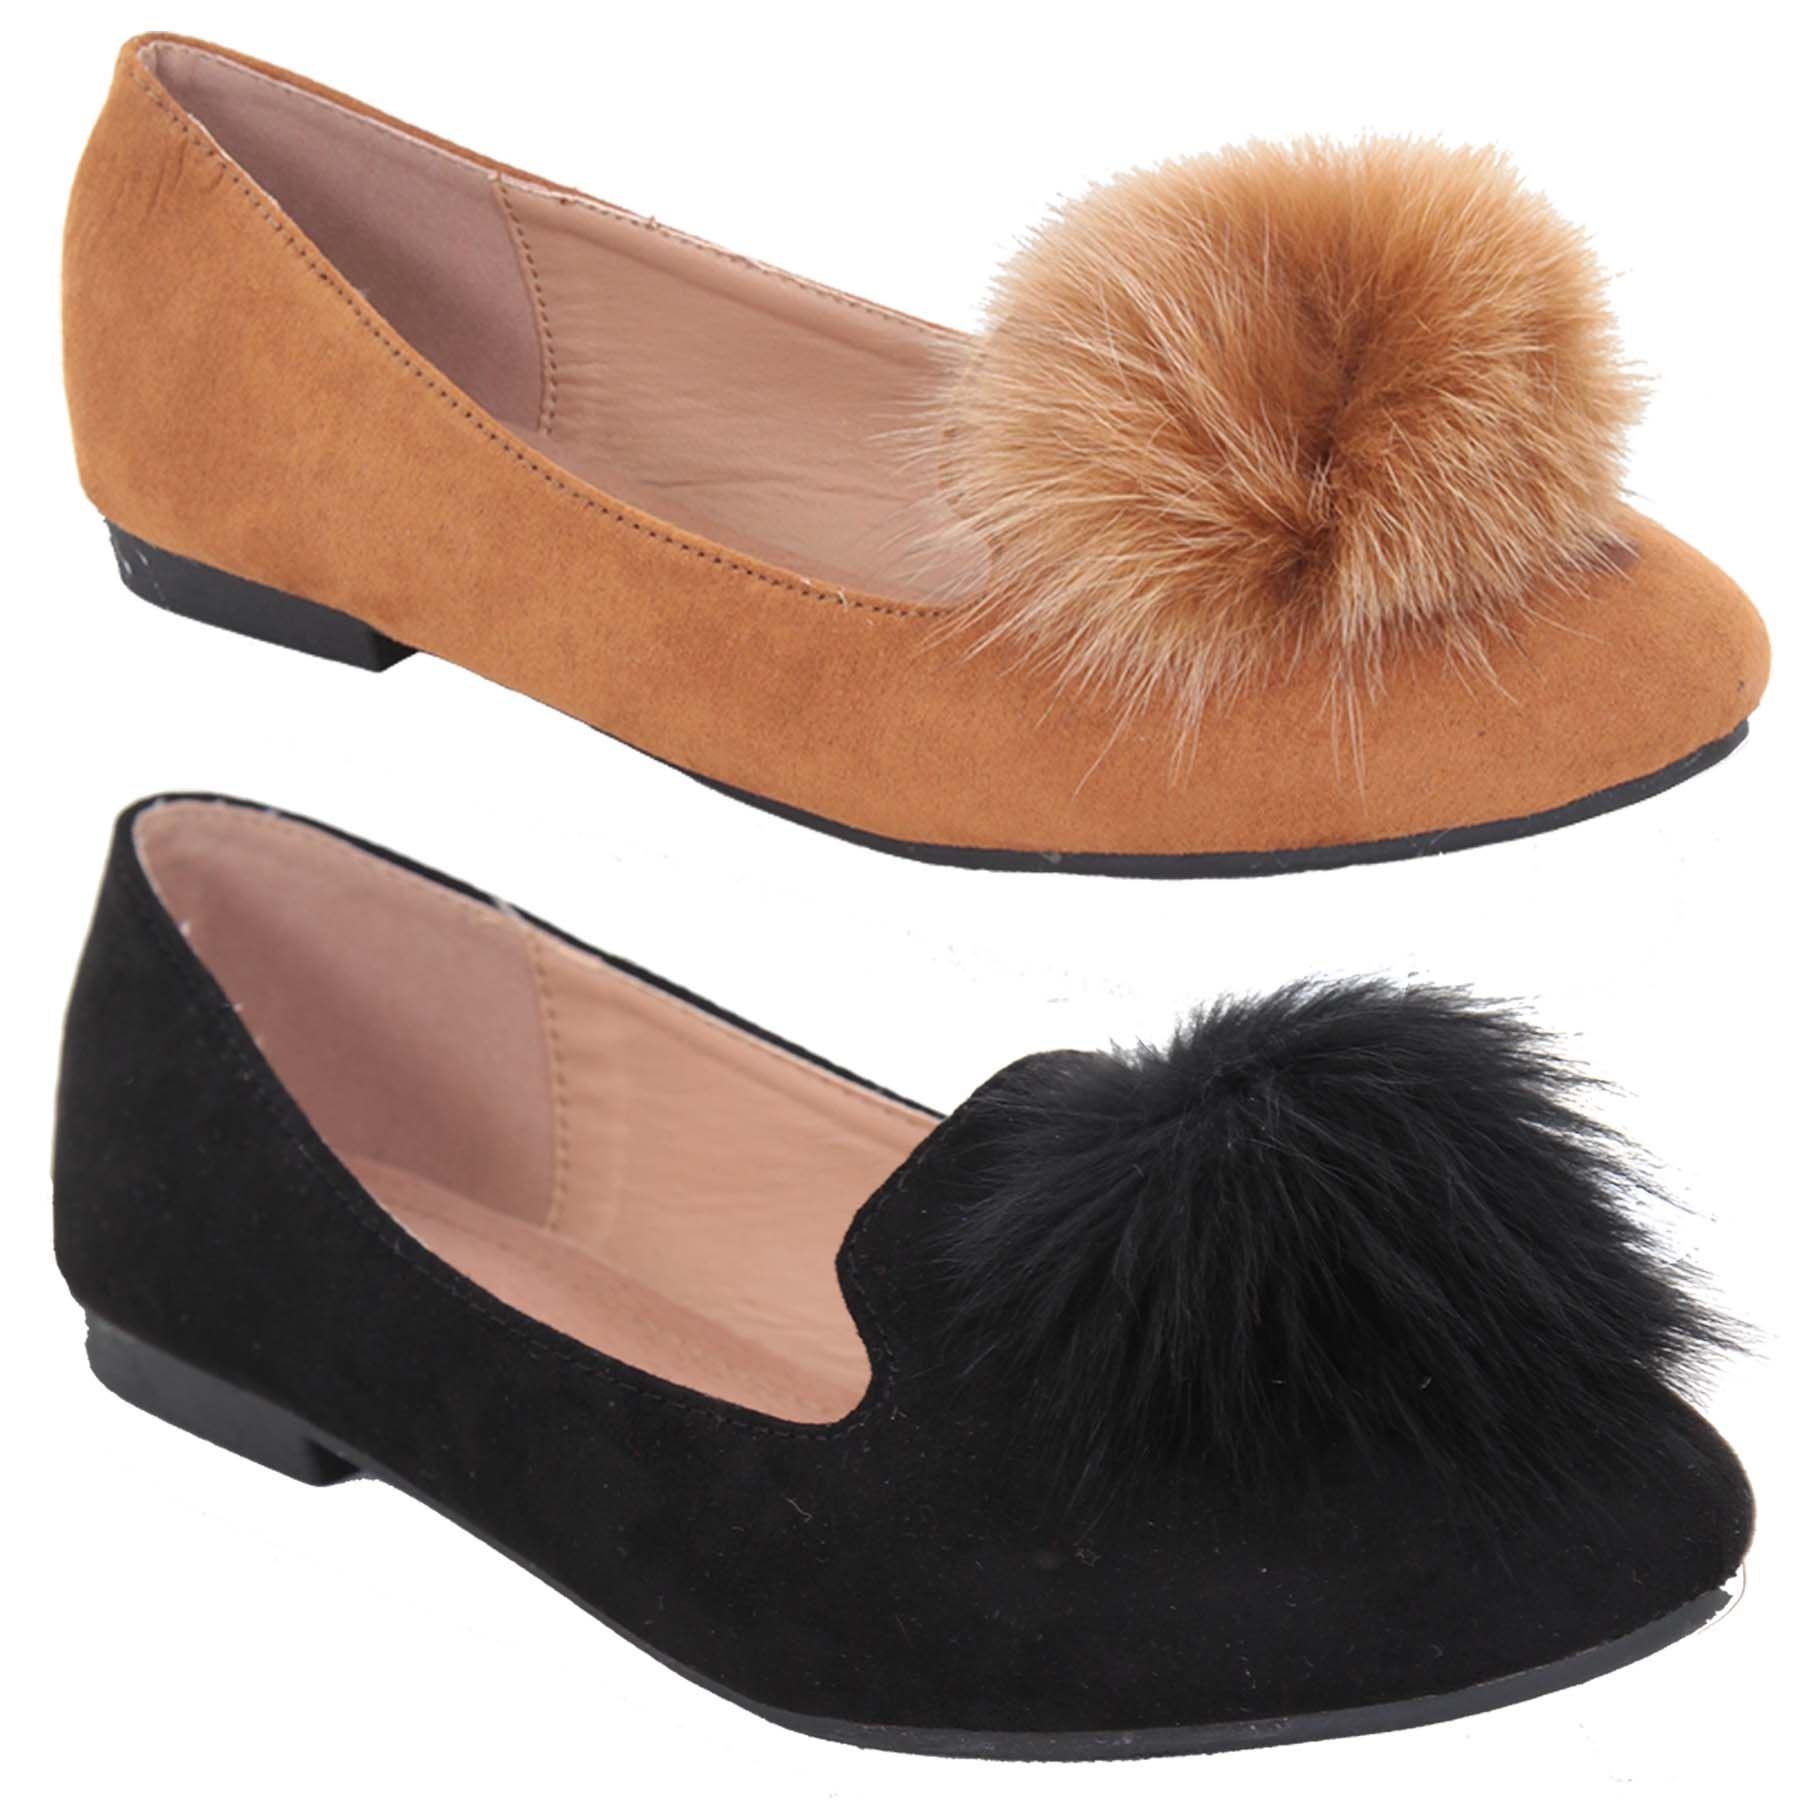 Womens Fur Pom Pom Tassel Slip On Suede Ballet Pumps Dolly Shoes Flats